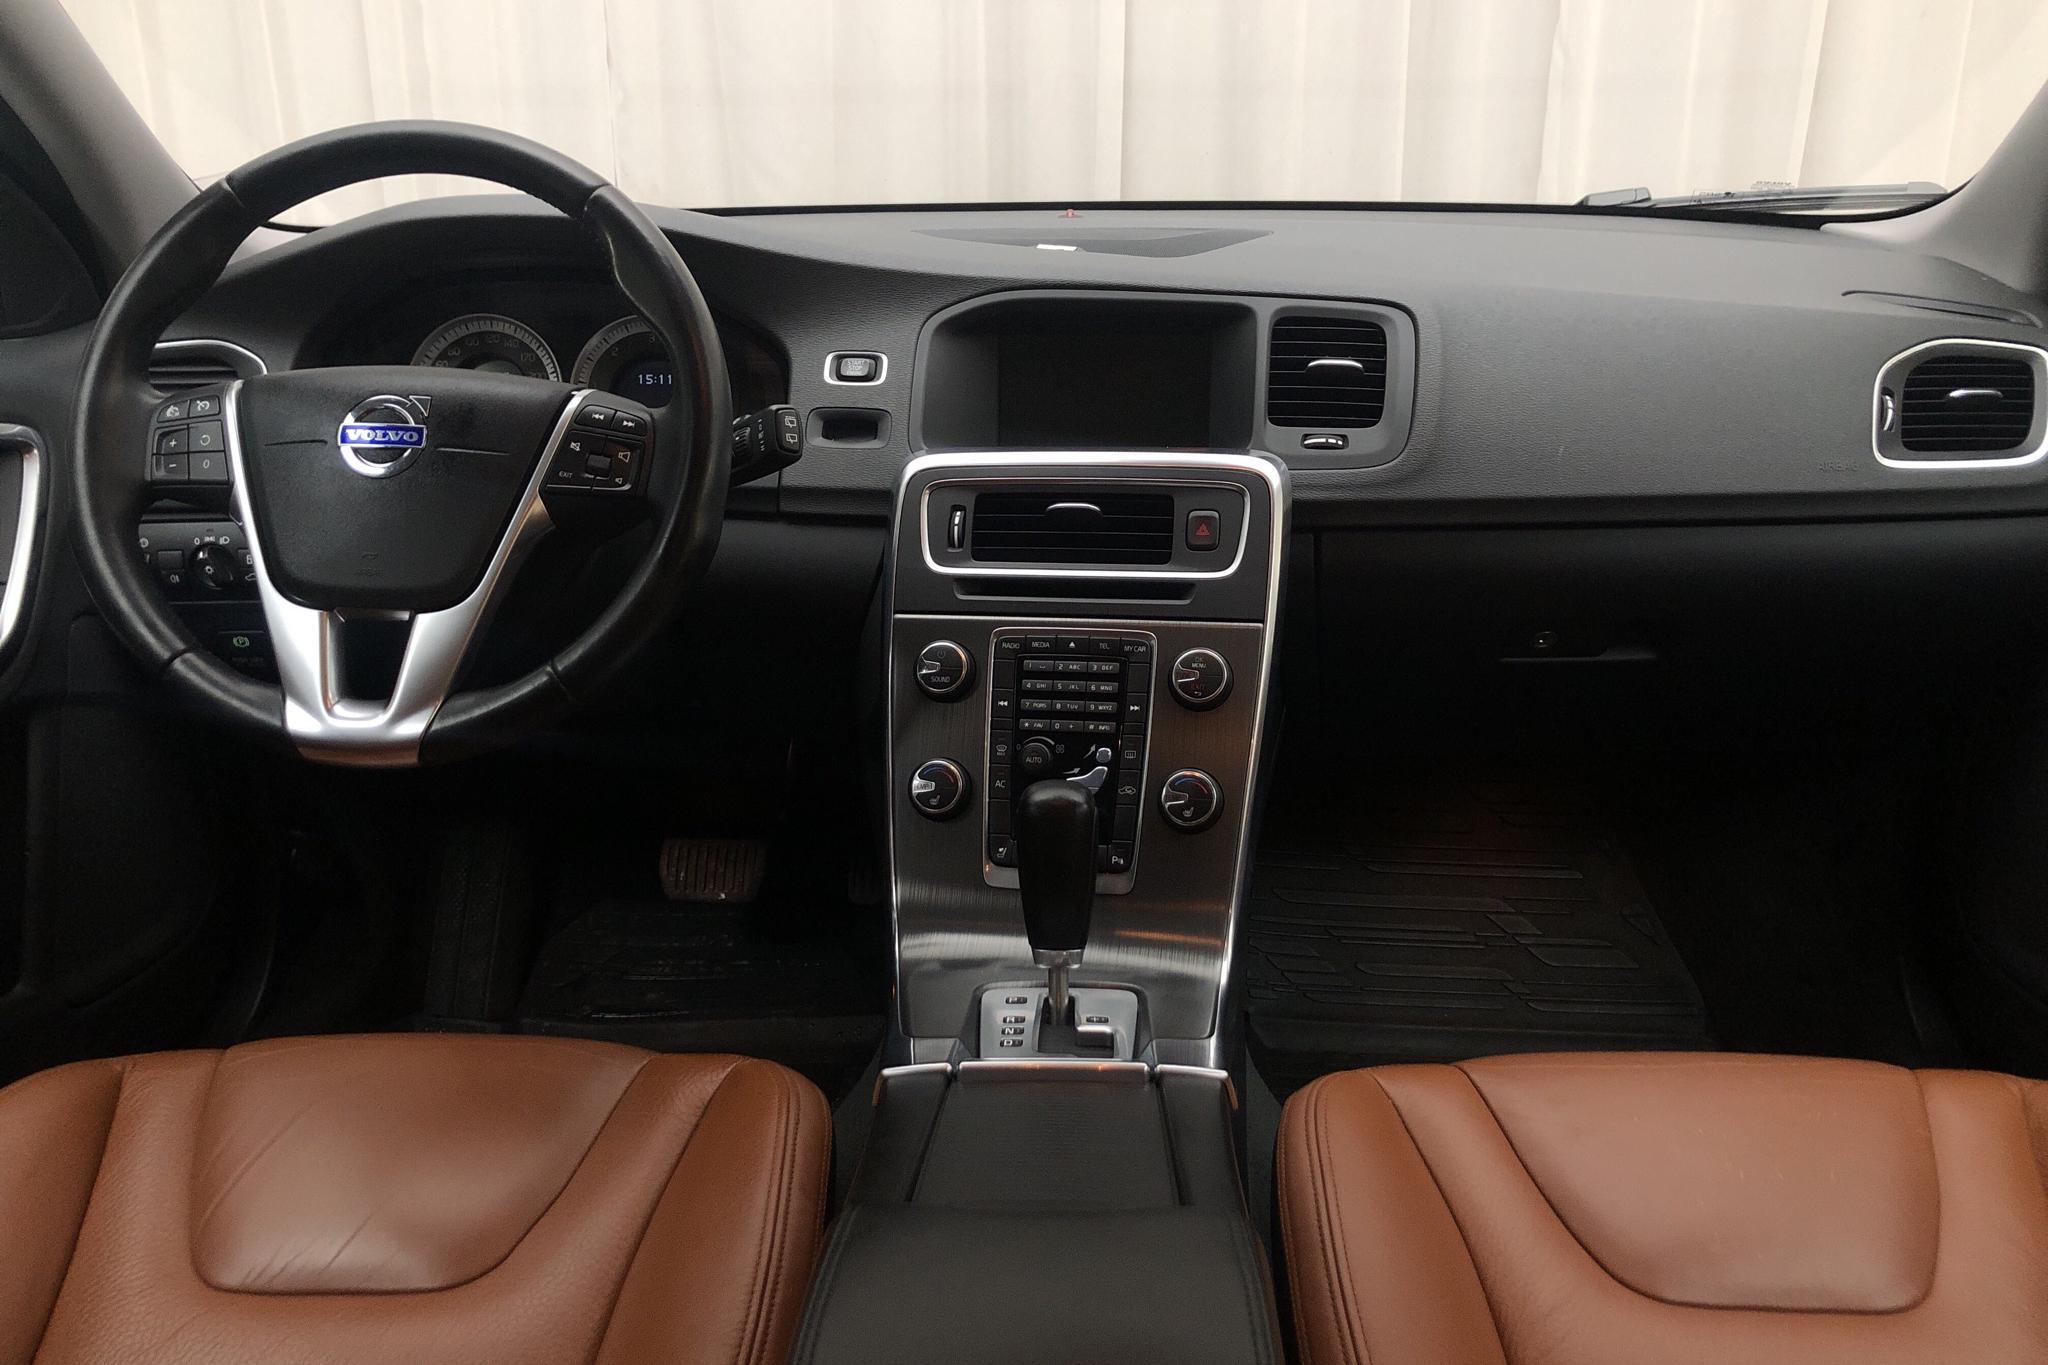 Volvo V60 D5 (205hk) - 113 090 km - Automatic - black - 2011